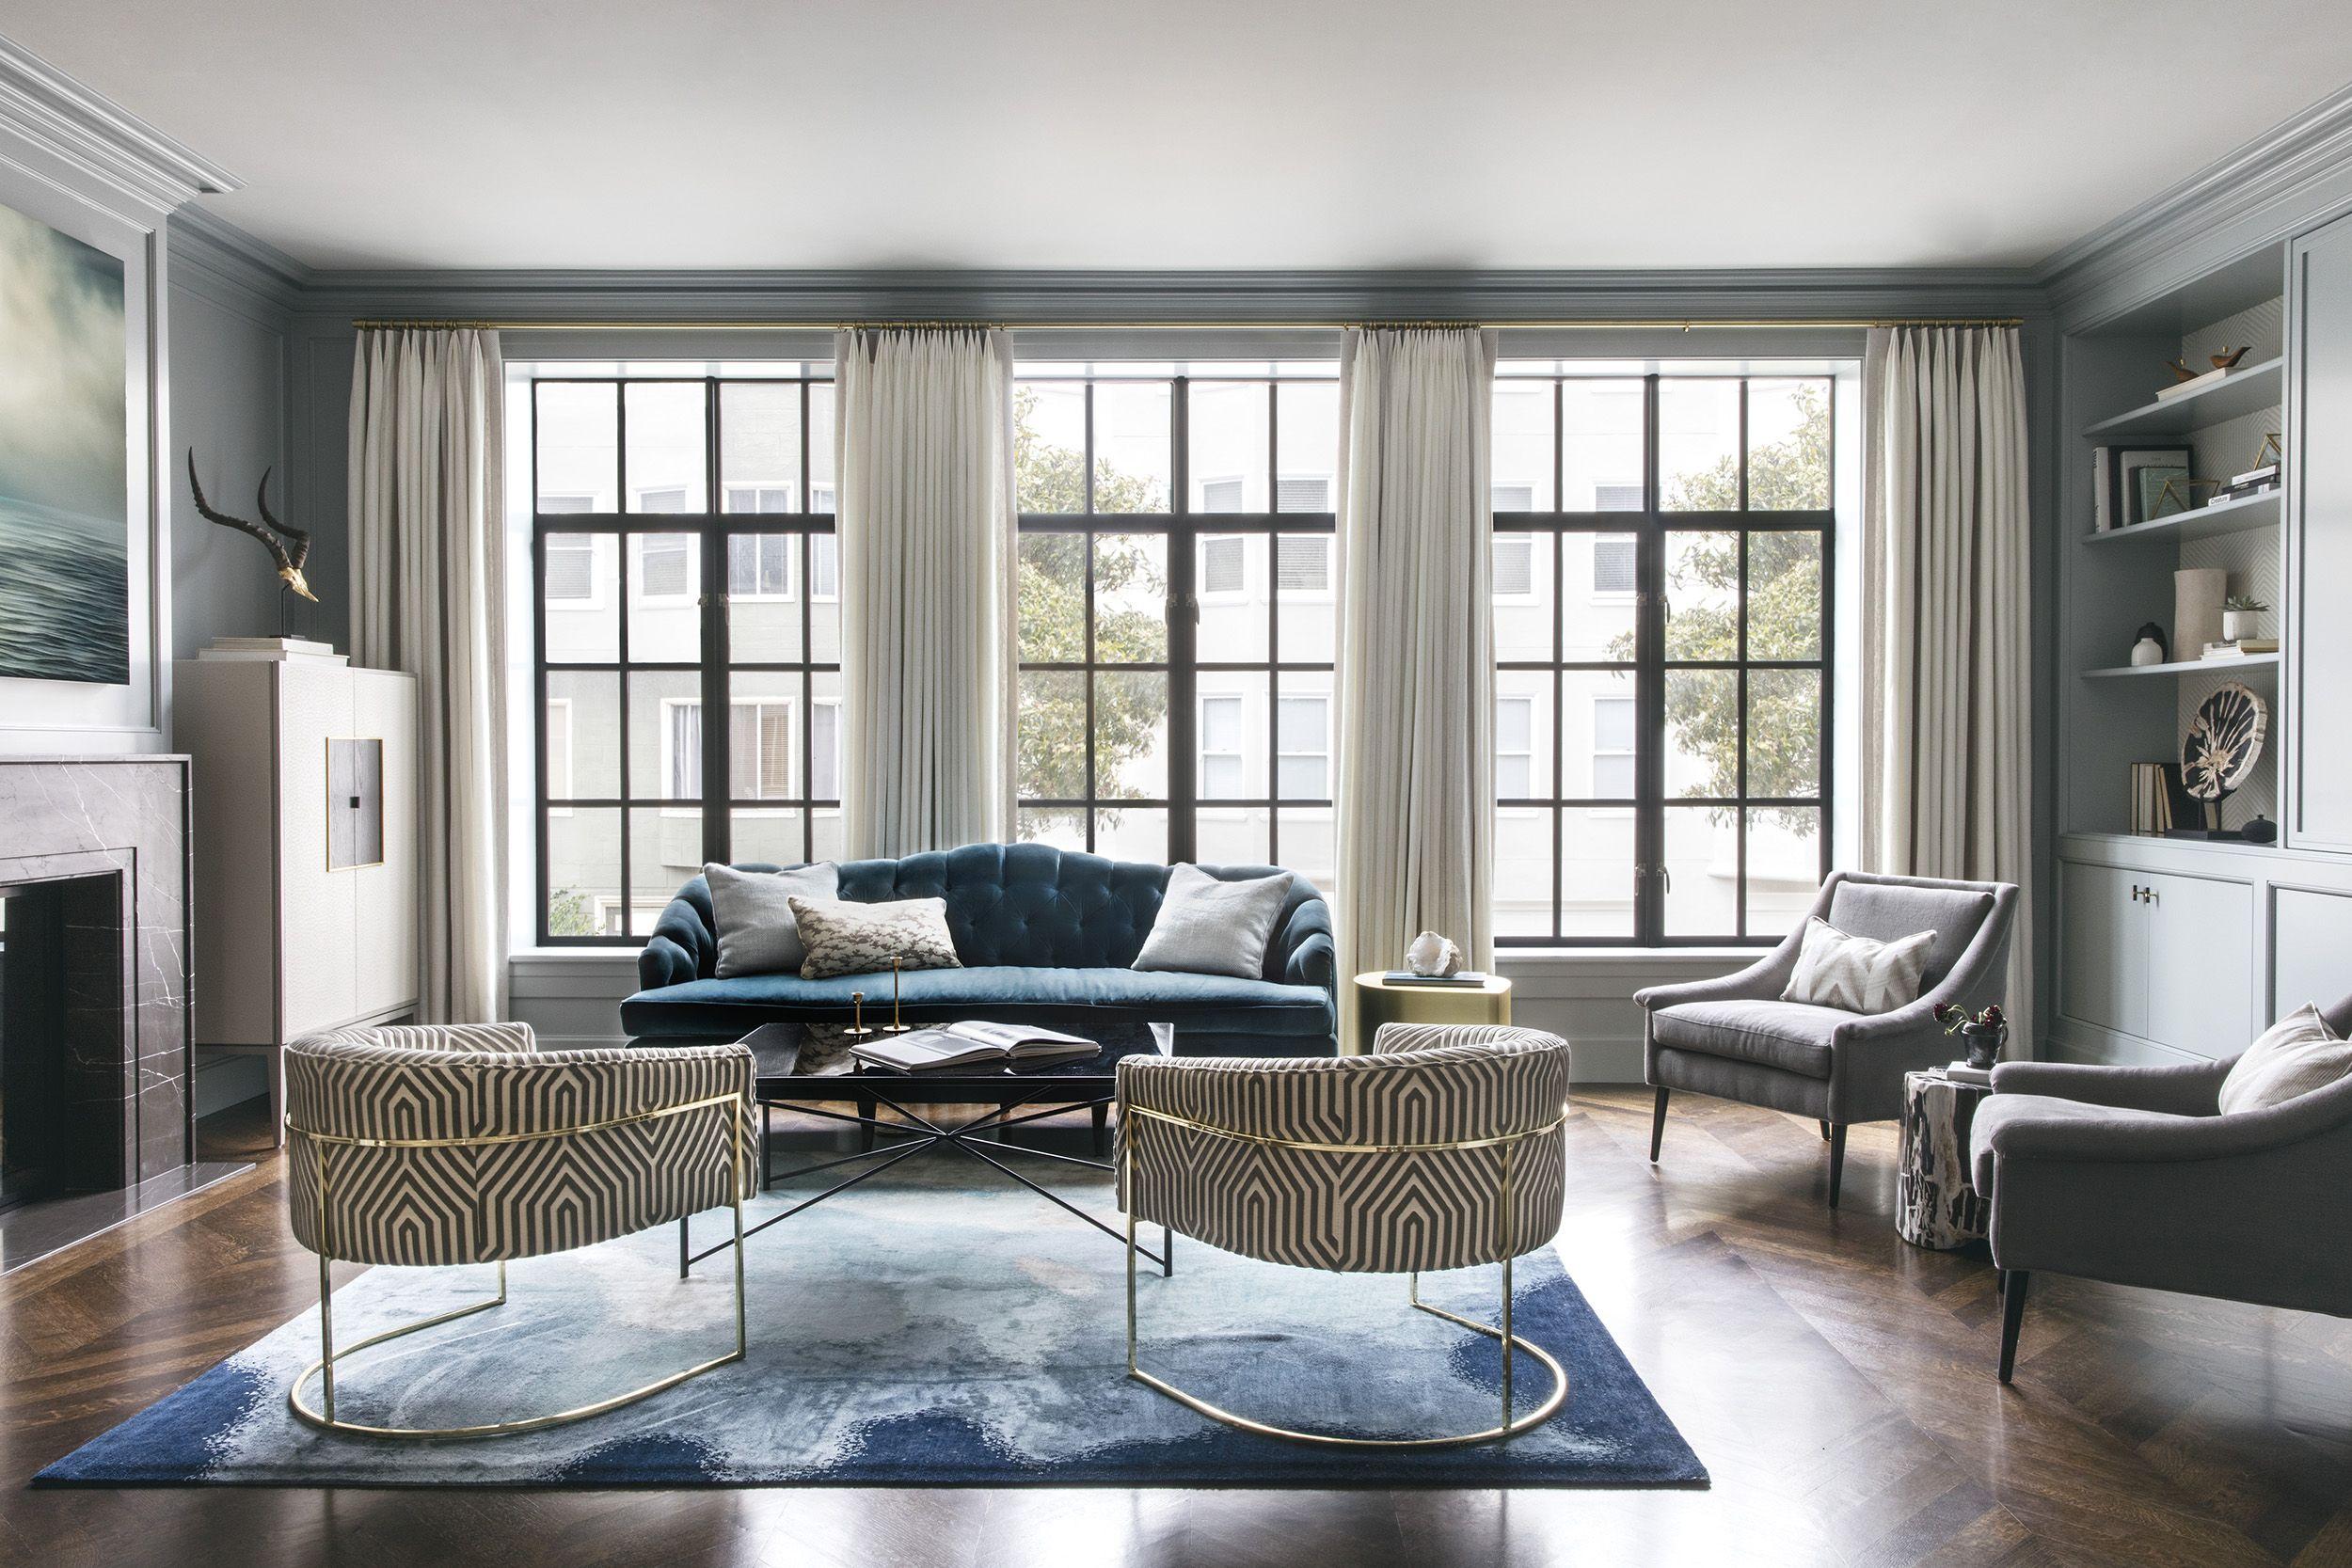 Lauren Nelson Design Marina Home Living Room Transitional Living Room Design Transitional Living Rooms Color Palette Living Room #transitional #living #room #designs